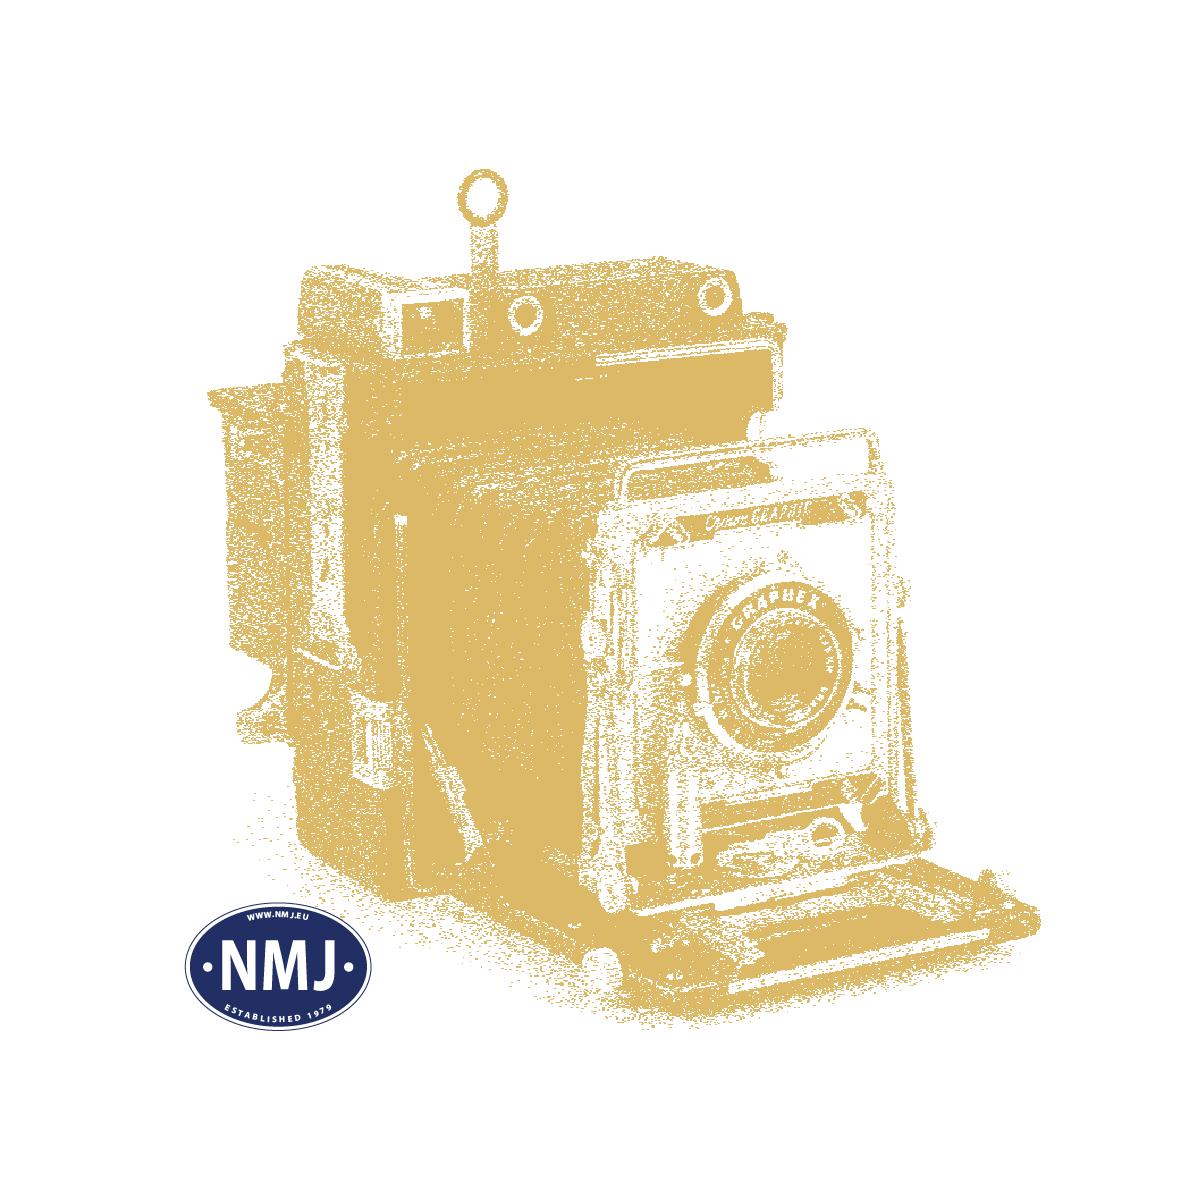 NMJT85.202 - NMJ Topline CargoNet Di8.707, DCC Sound